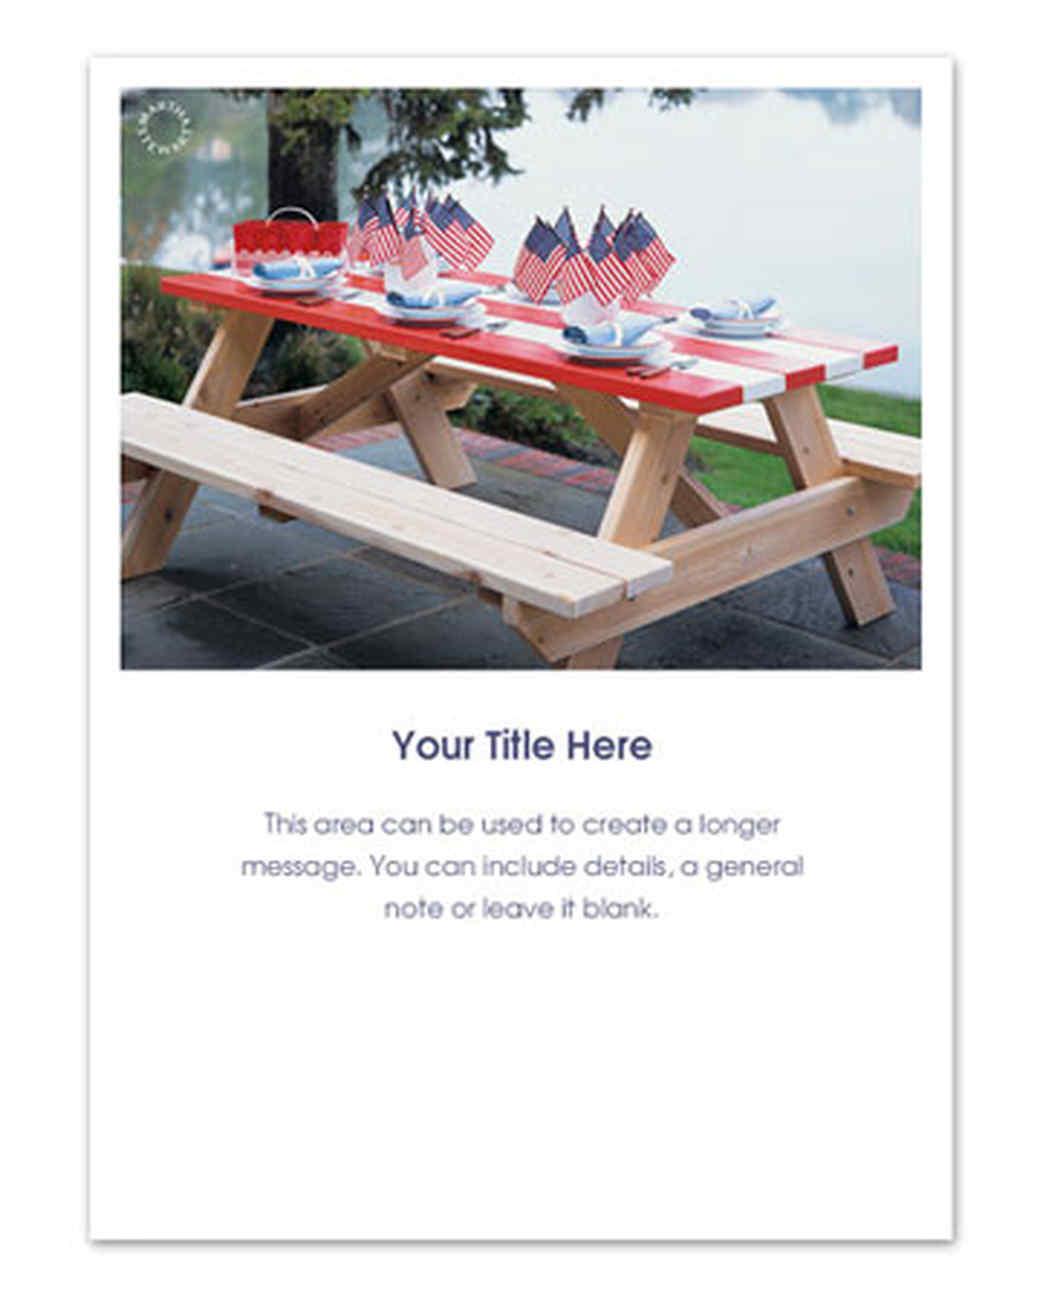 pingg-summer-striped-picnic-table.jpg